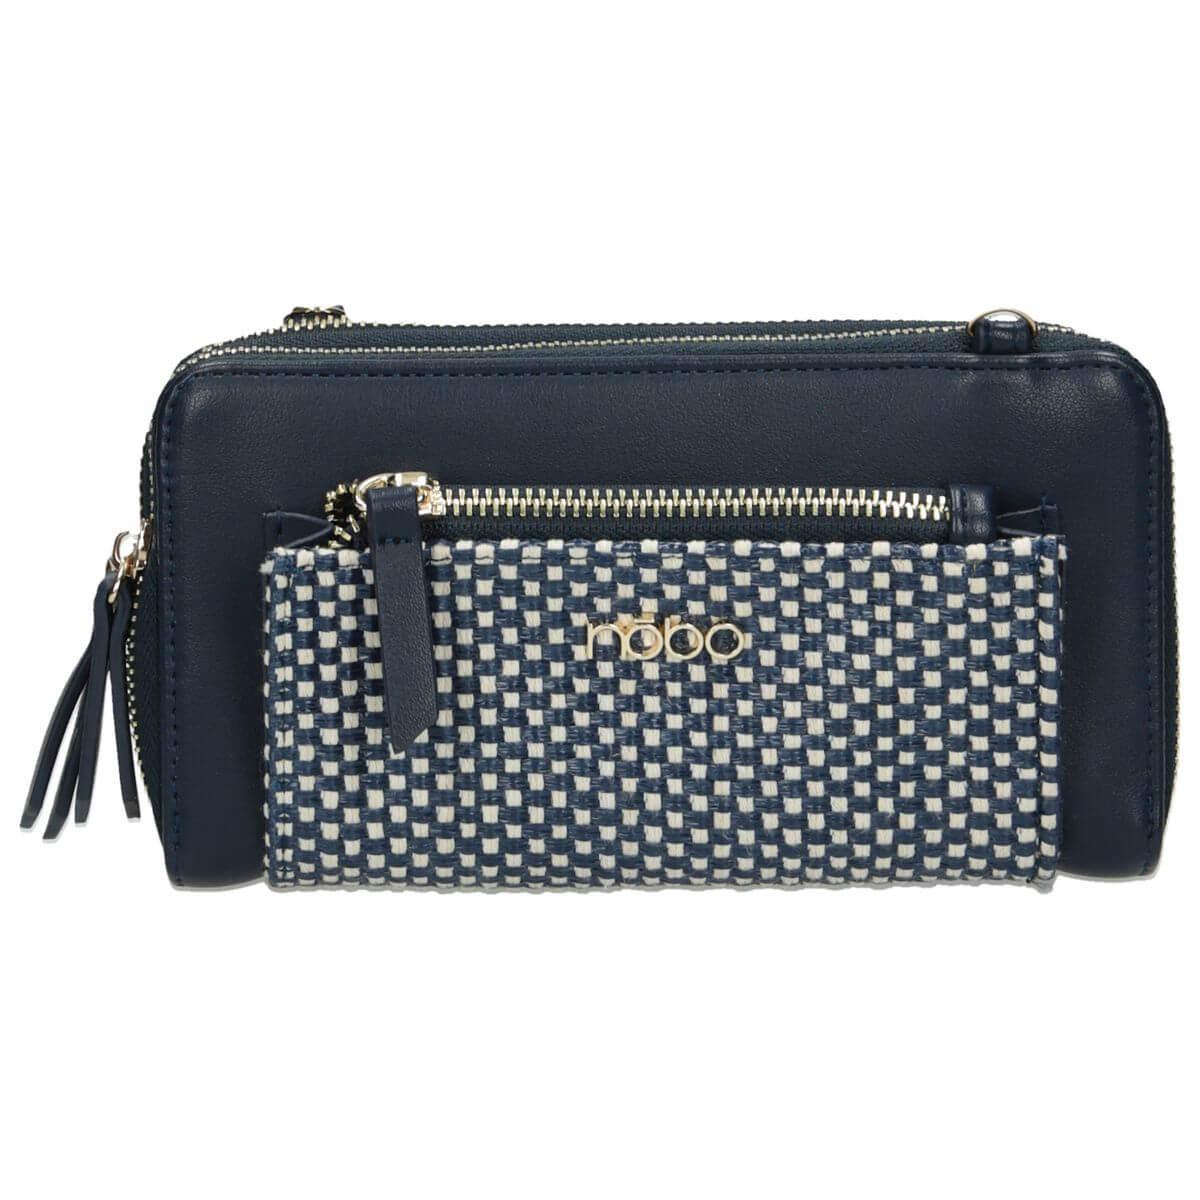 Nobo Woman's Bag NBAG-I1590-C013 Navy Blue